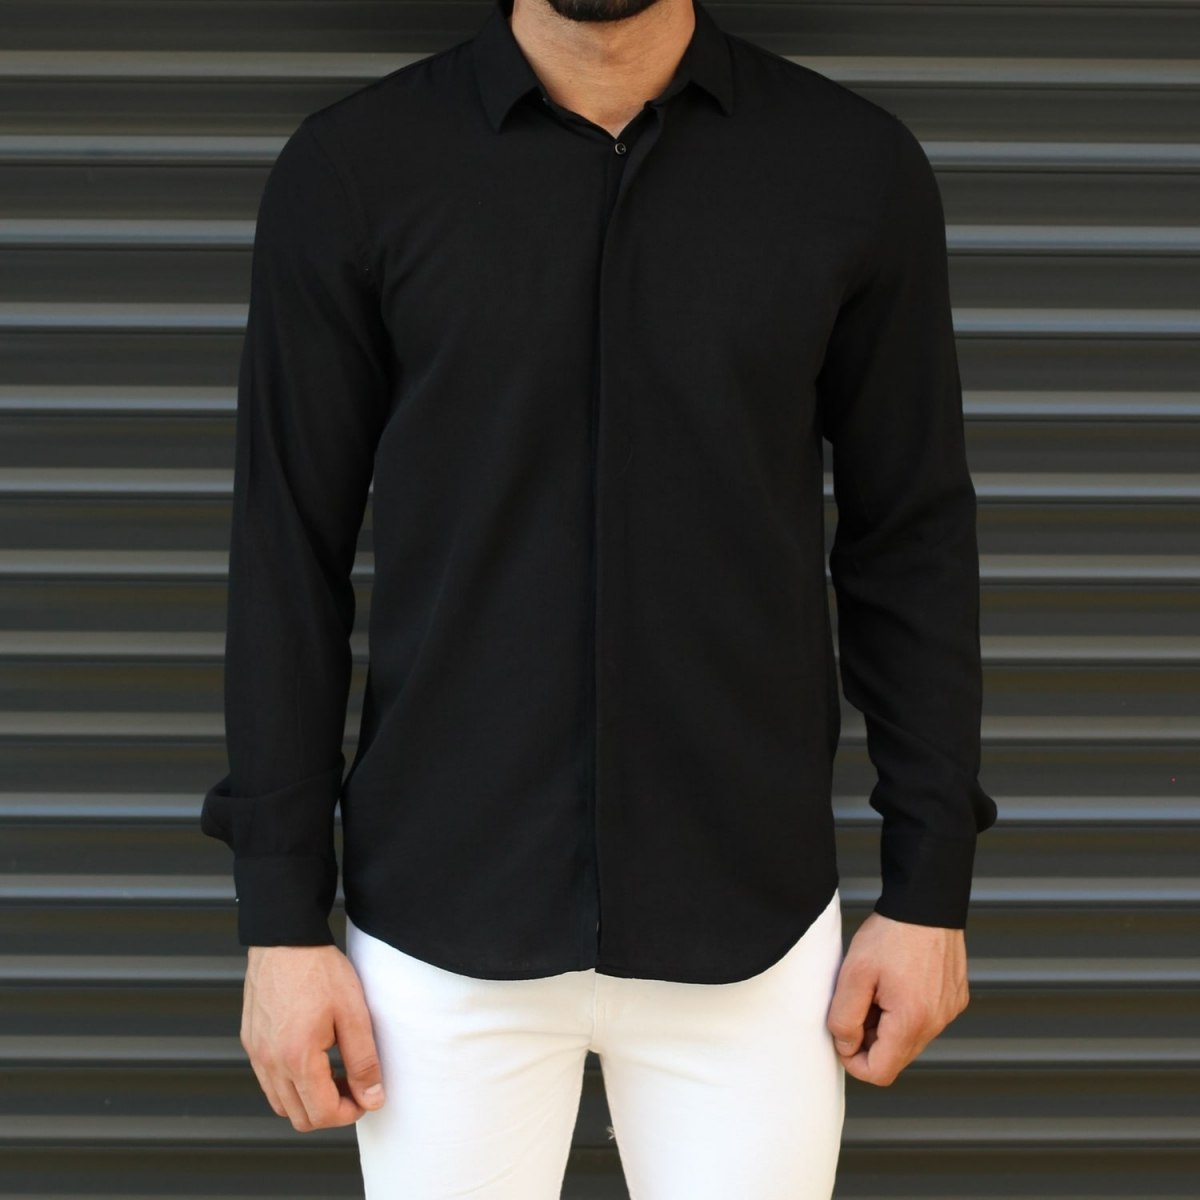 Men's Basic Stylish Casual Shirt In Solid Black